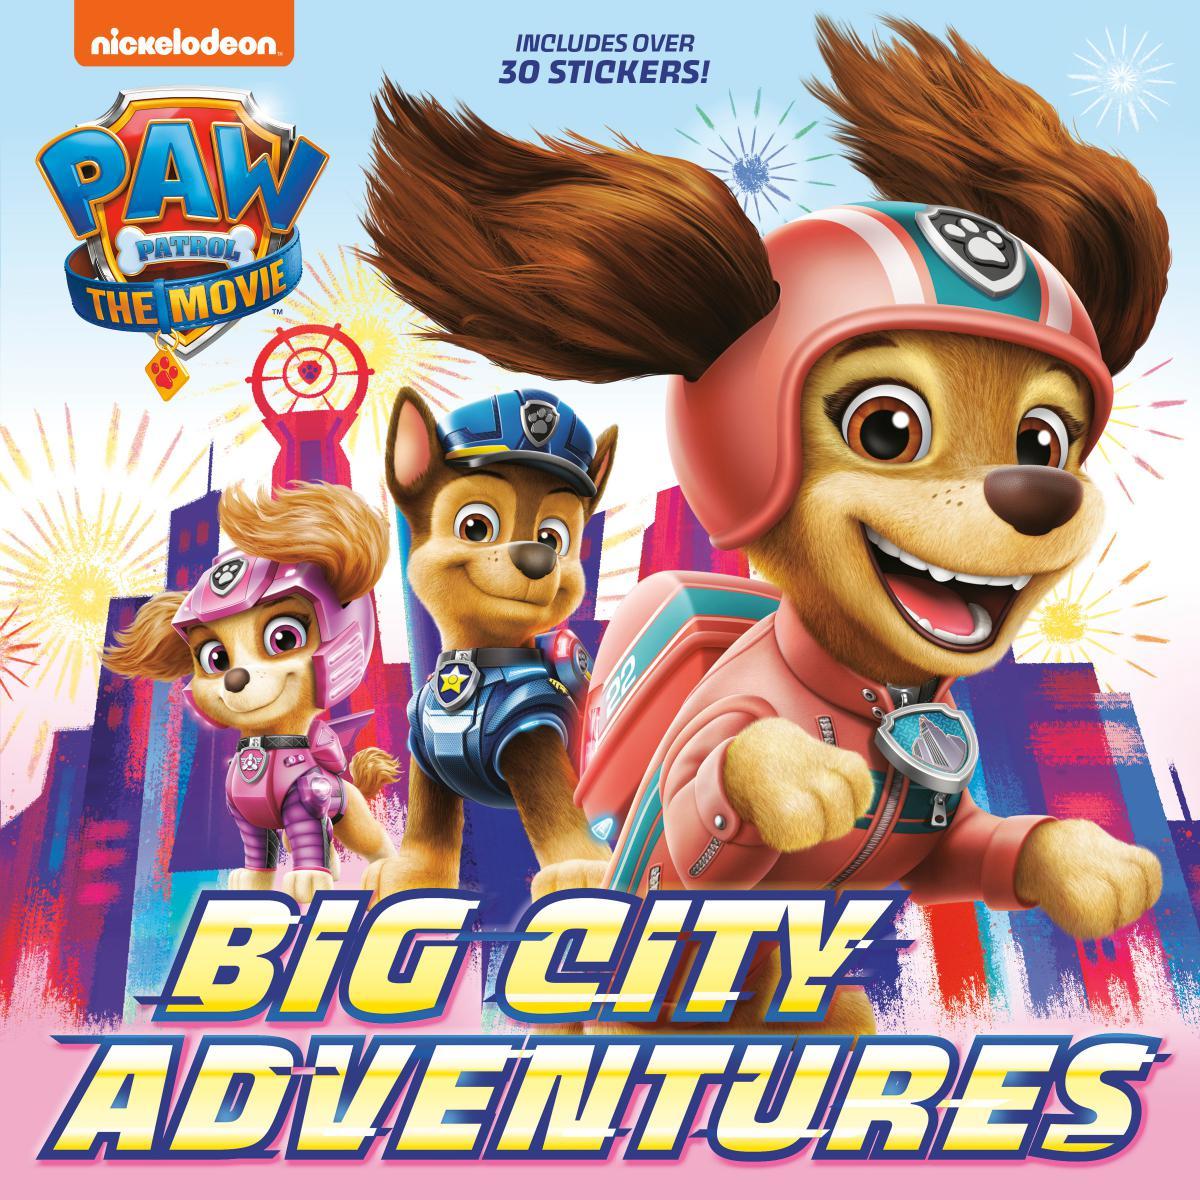 PAW Patrol: The Movie: Big City Adventures